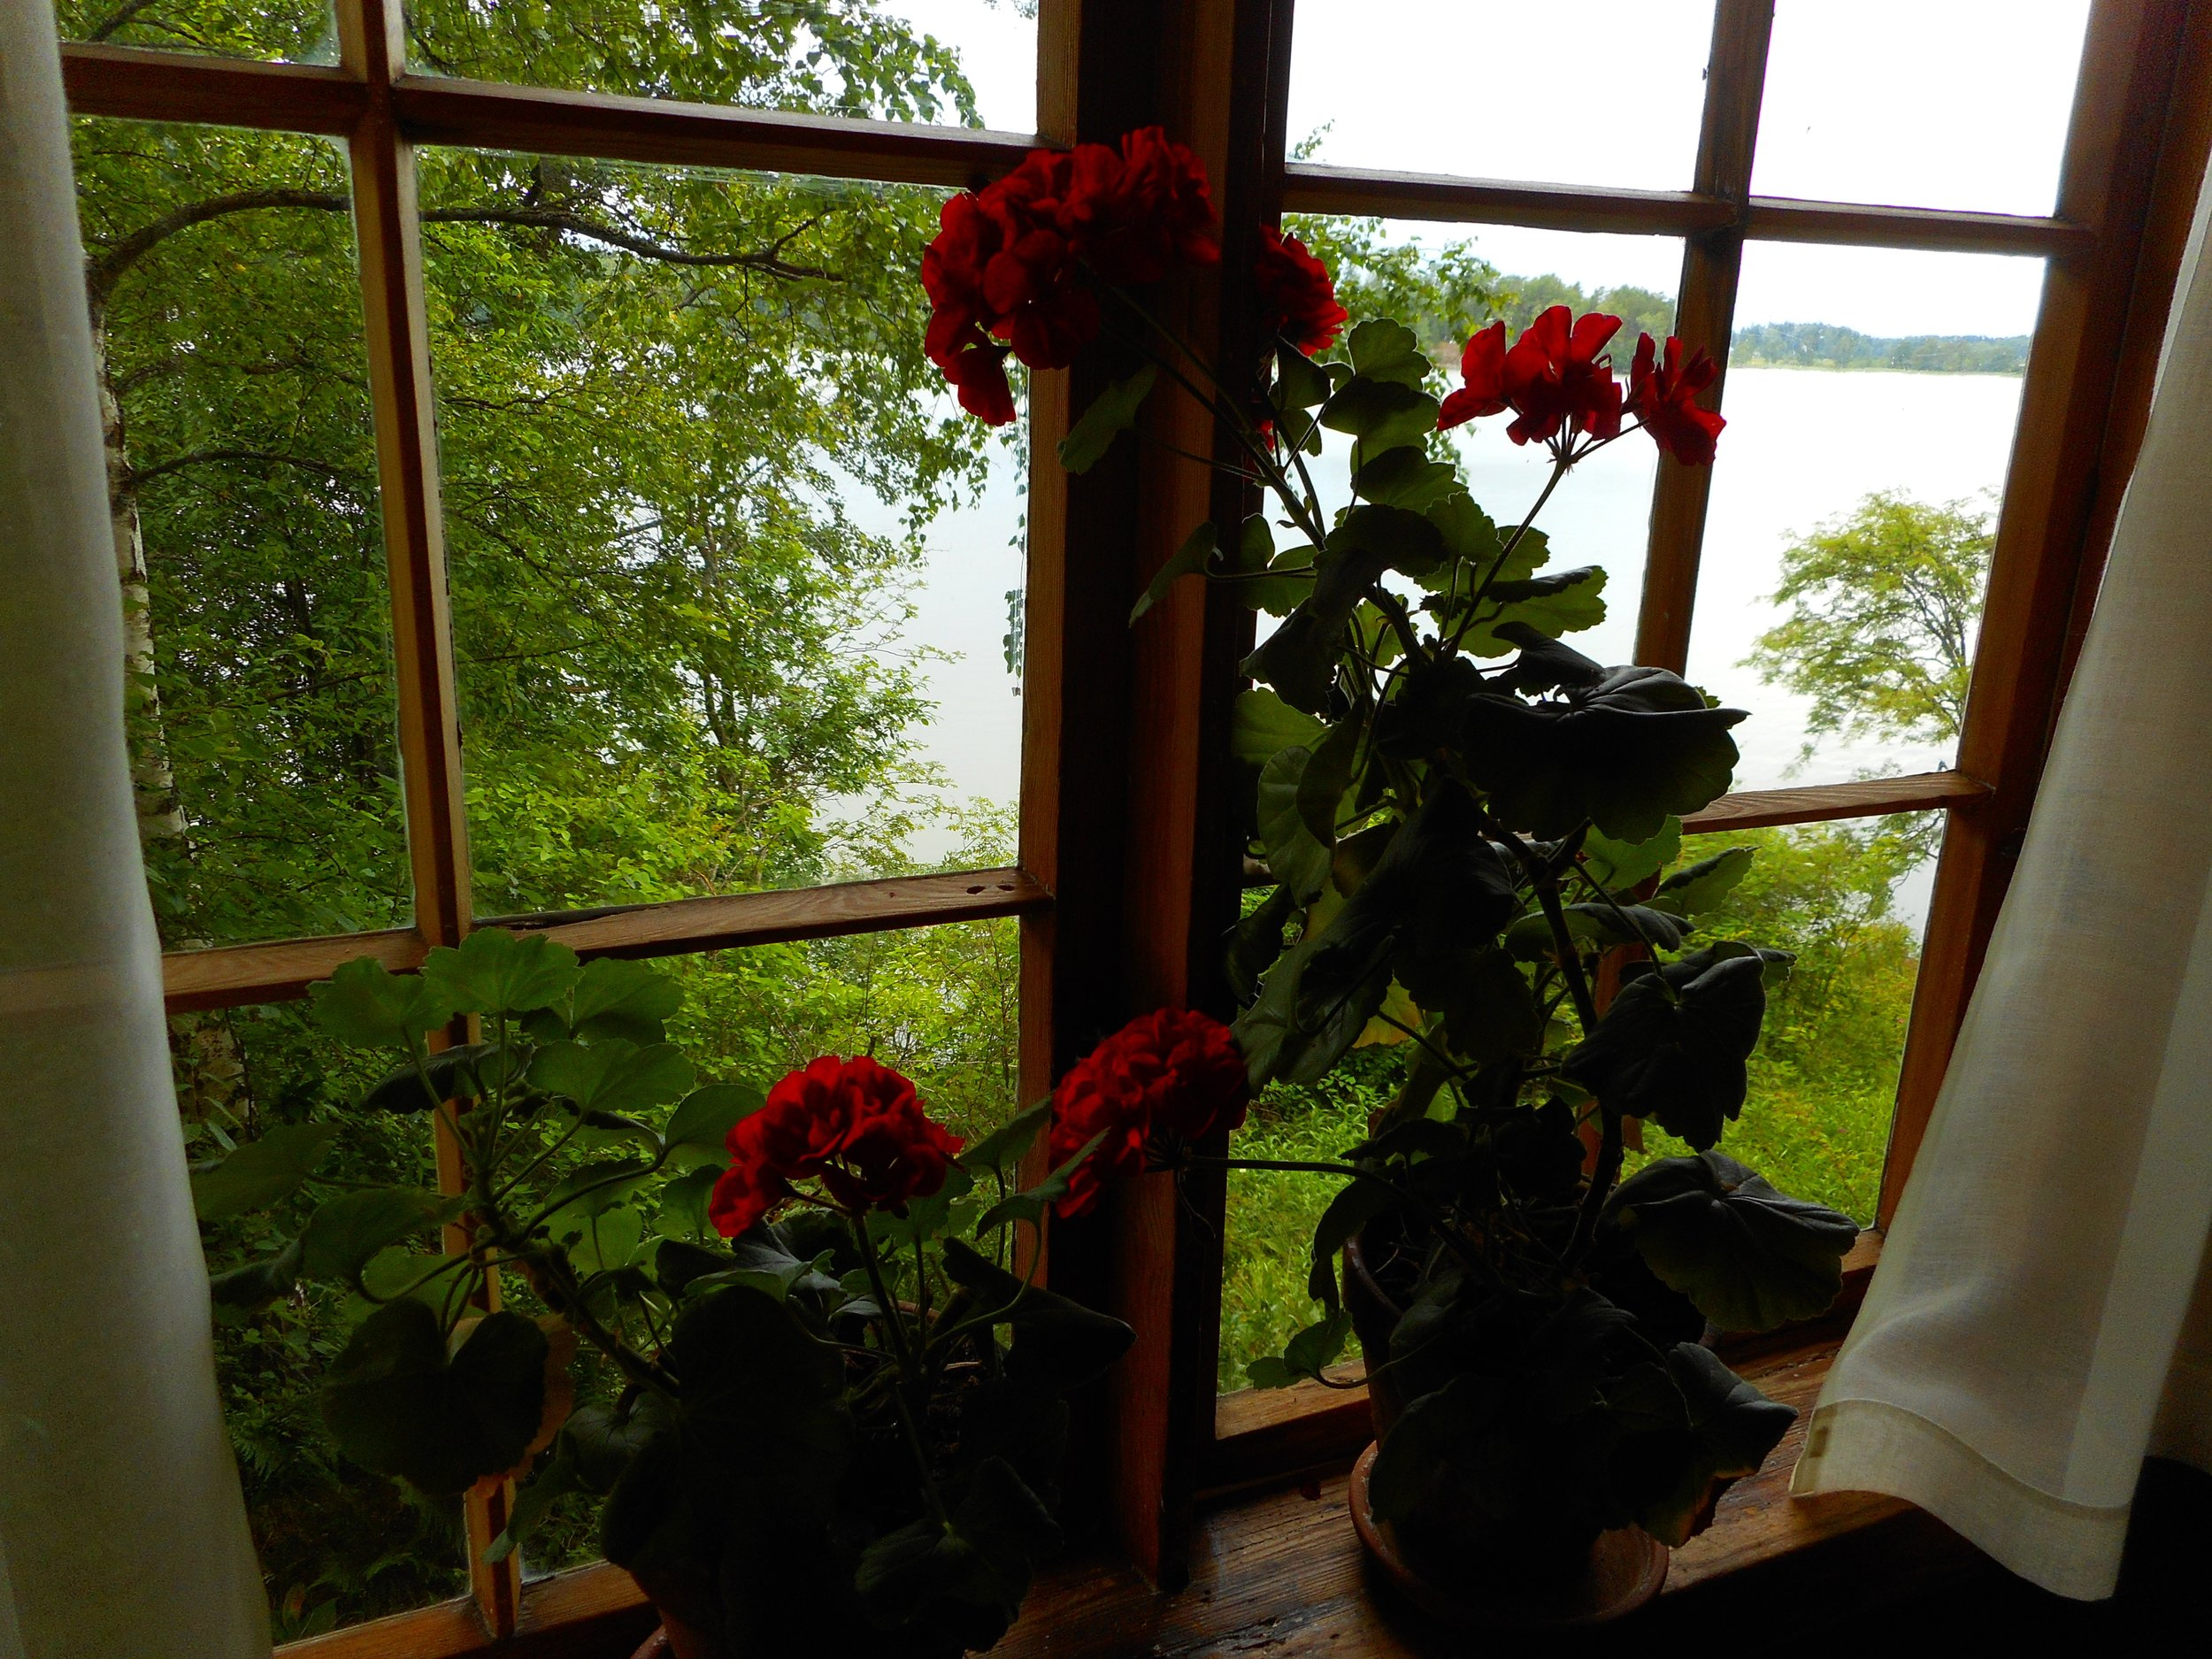 Lake Tuusula Guided trip from Helsinki